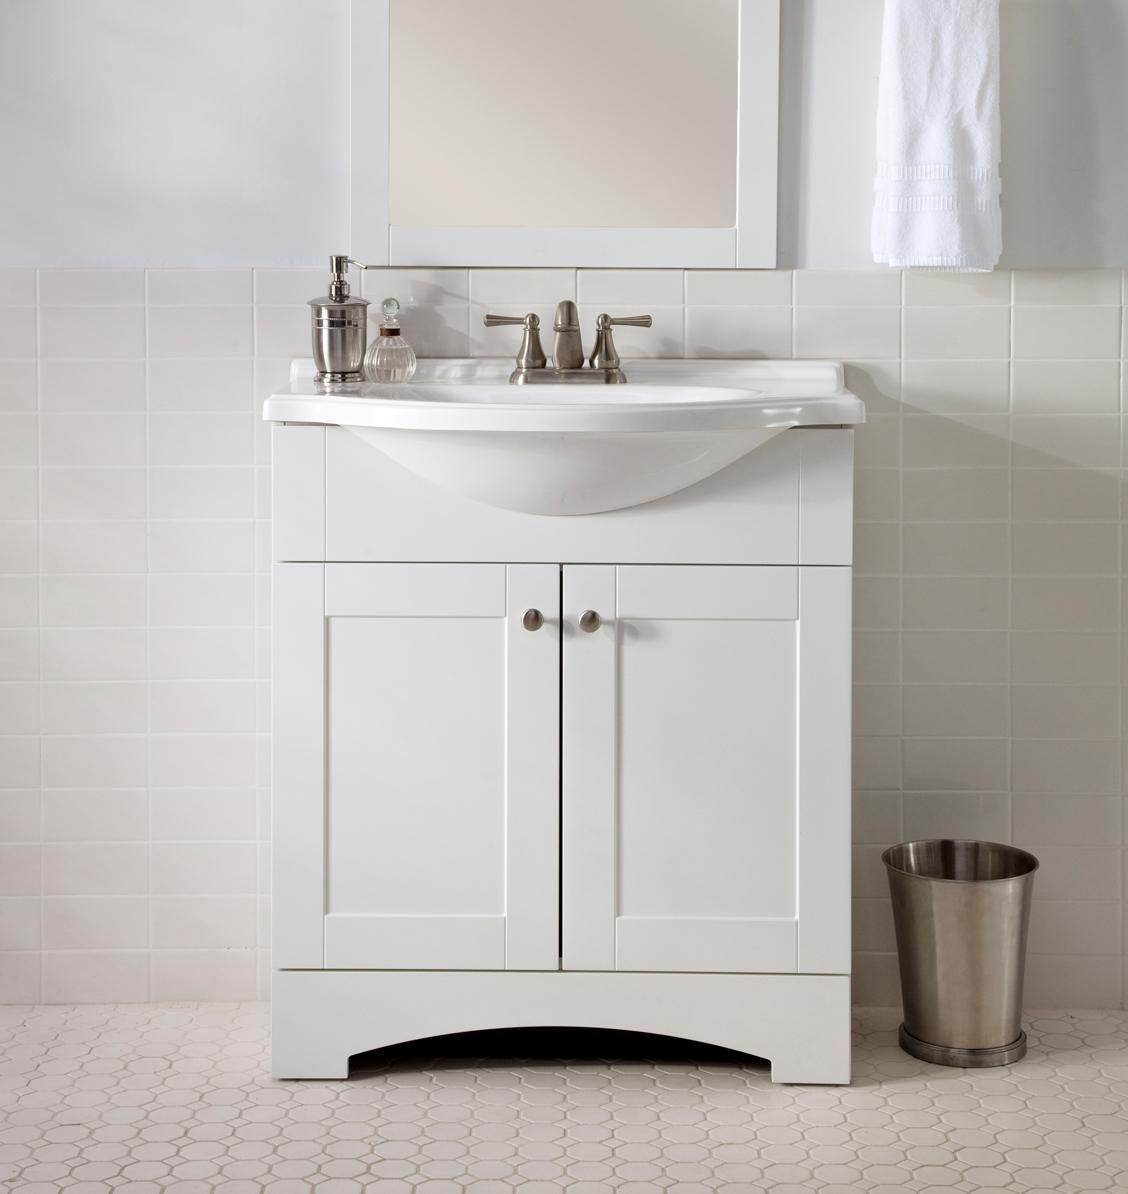 Narrow Bathroom Cabinet White | Bathroom Ideas | Pinterest | Narrow ...